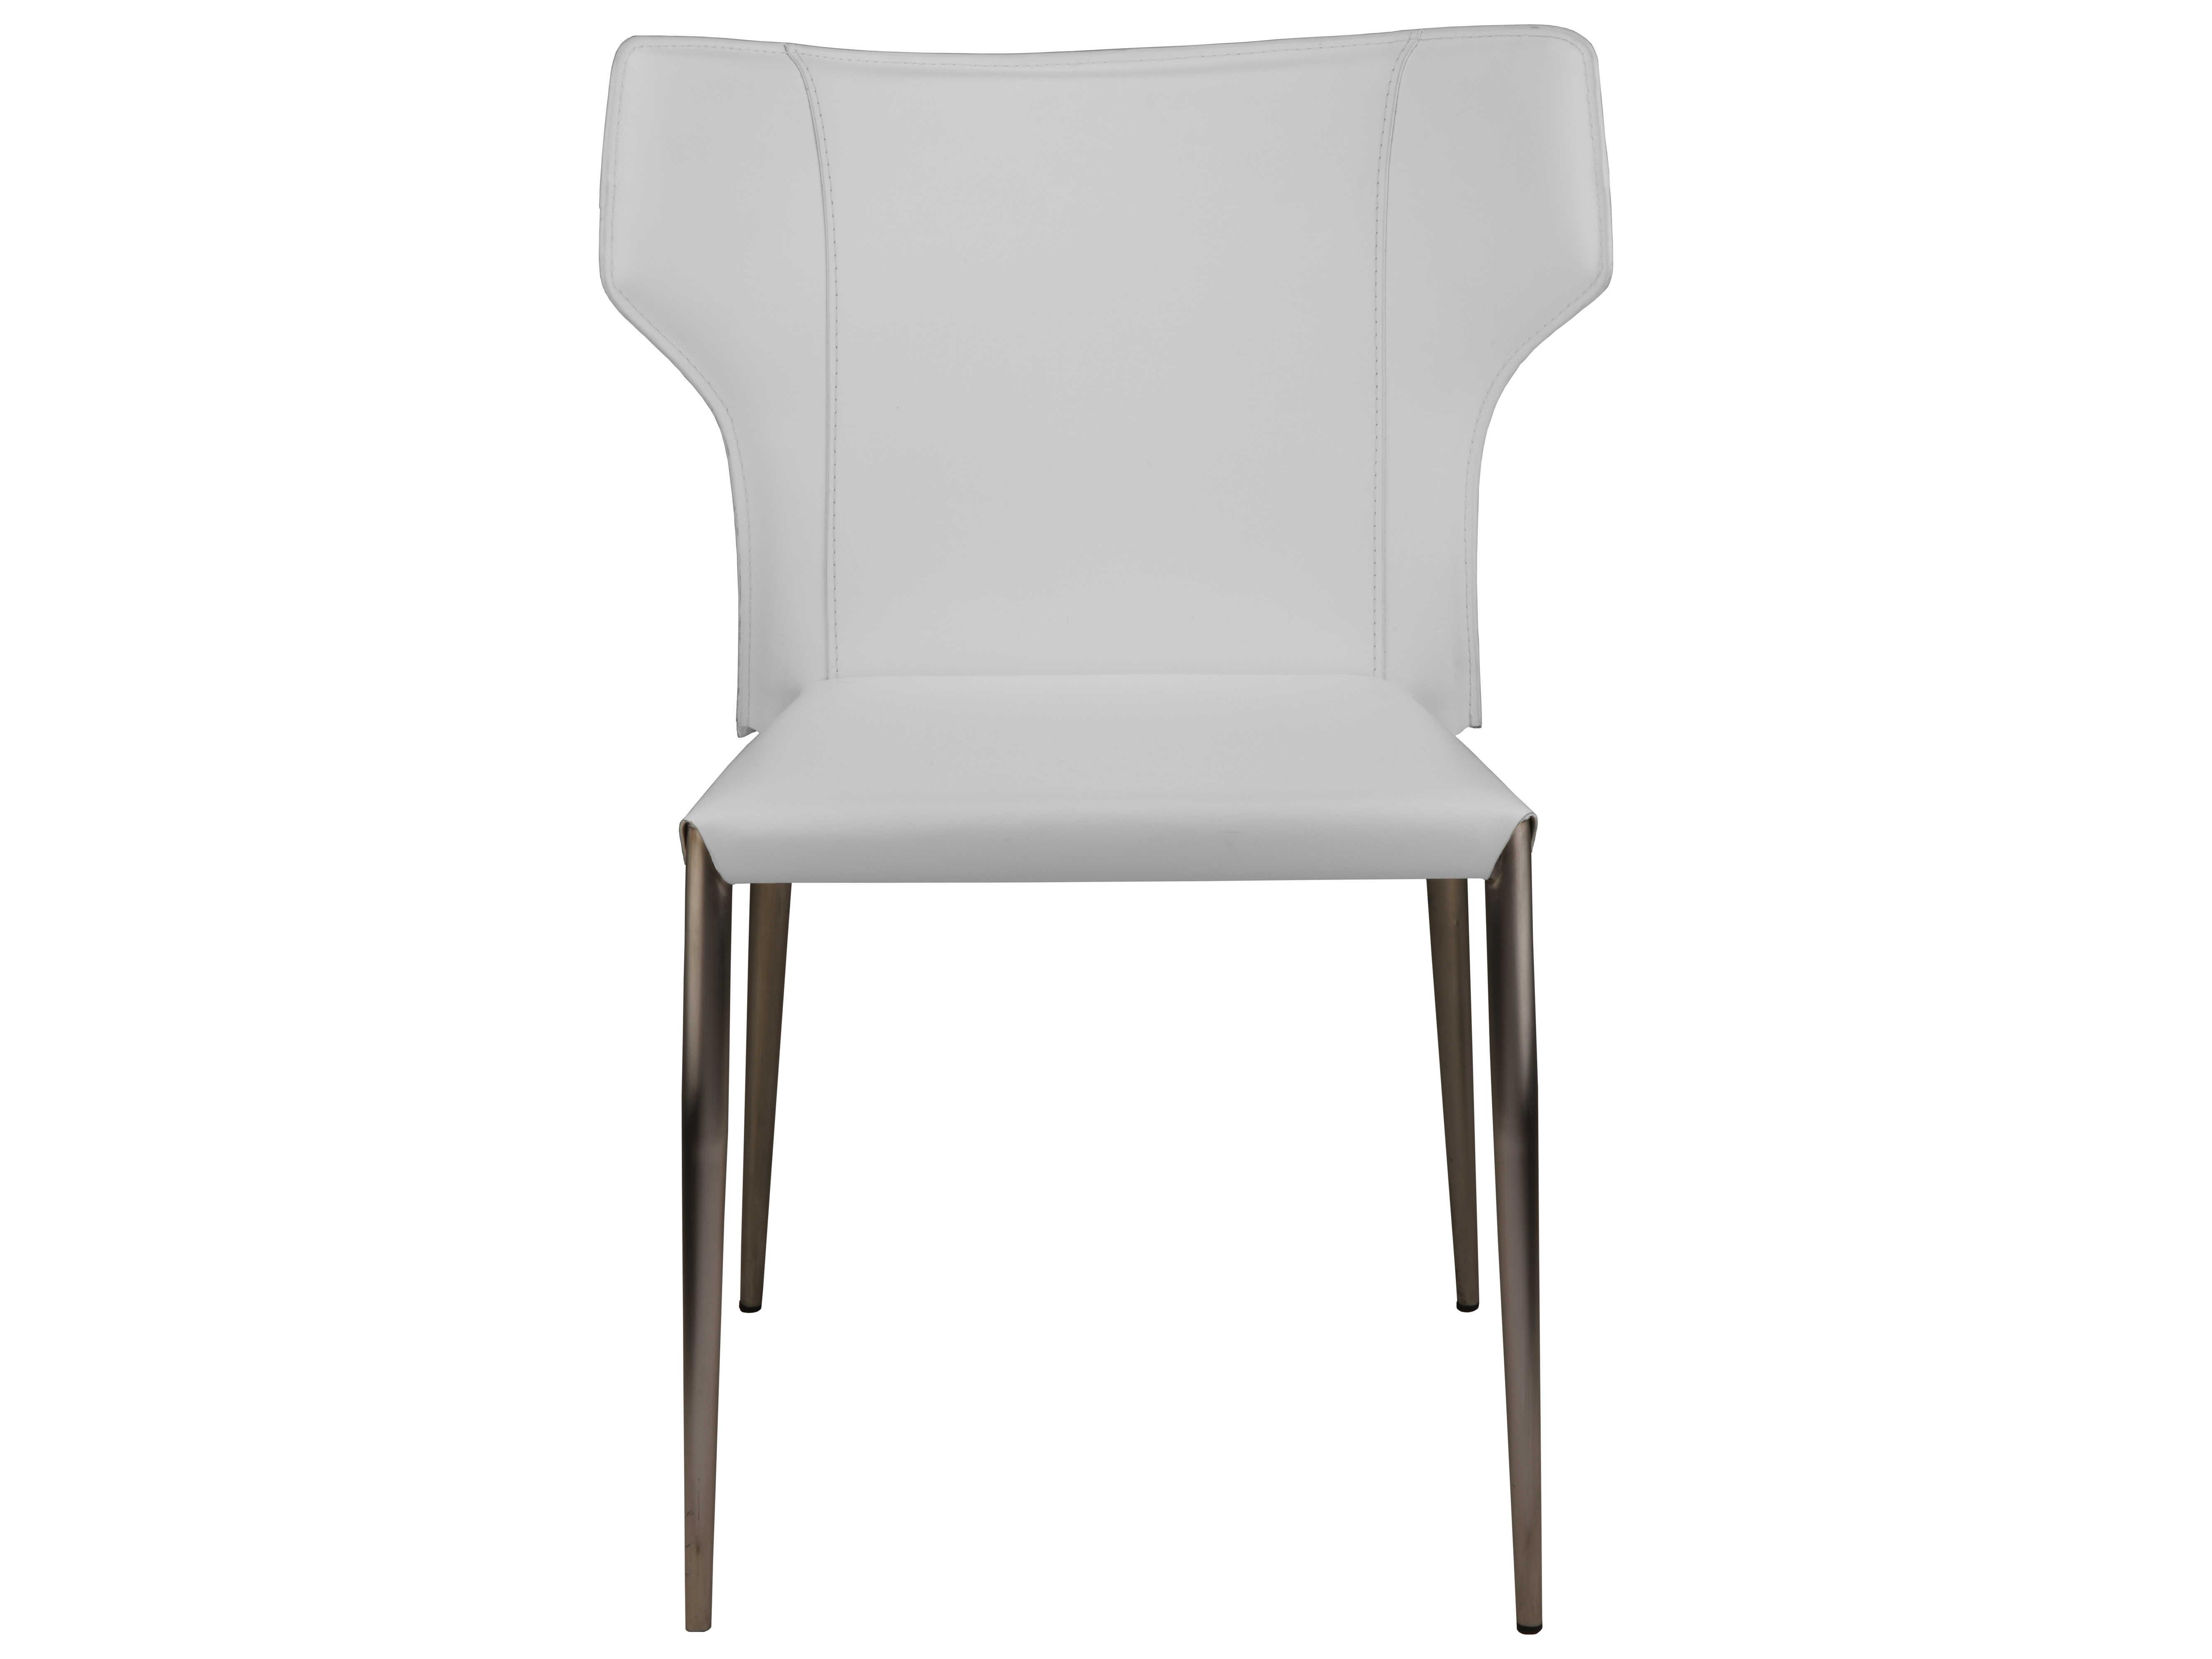 Nuevo Living Wayne Dining Side Chair | NUEWAYNEDININGCHAIR